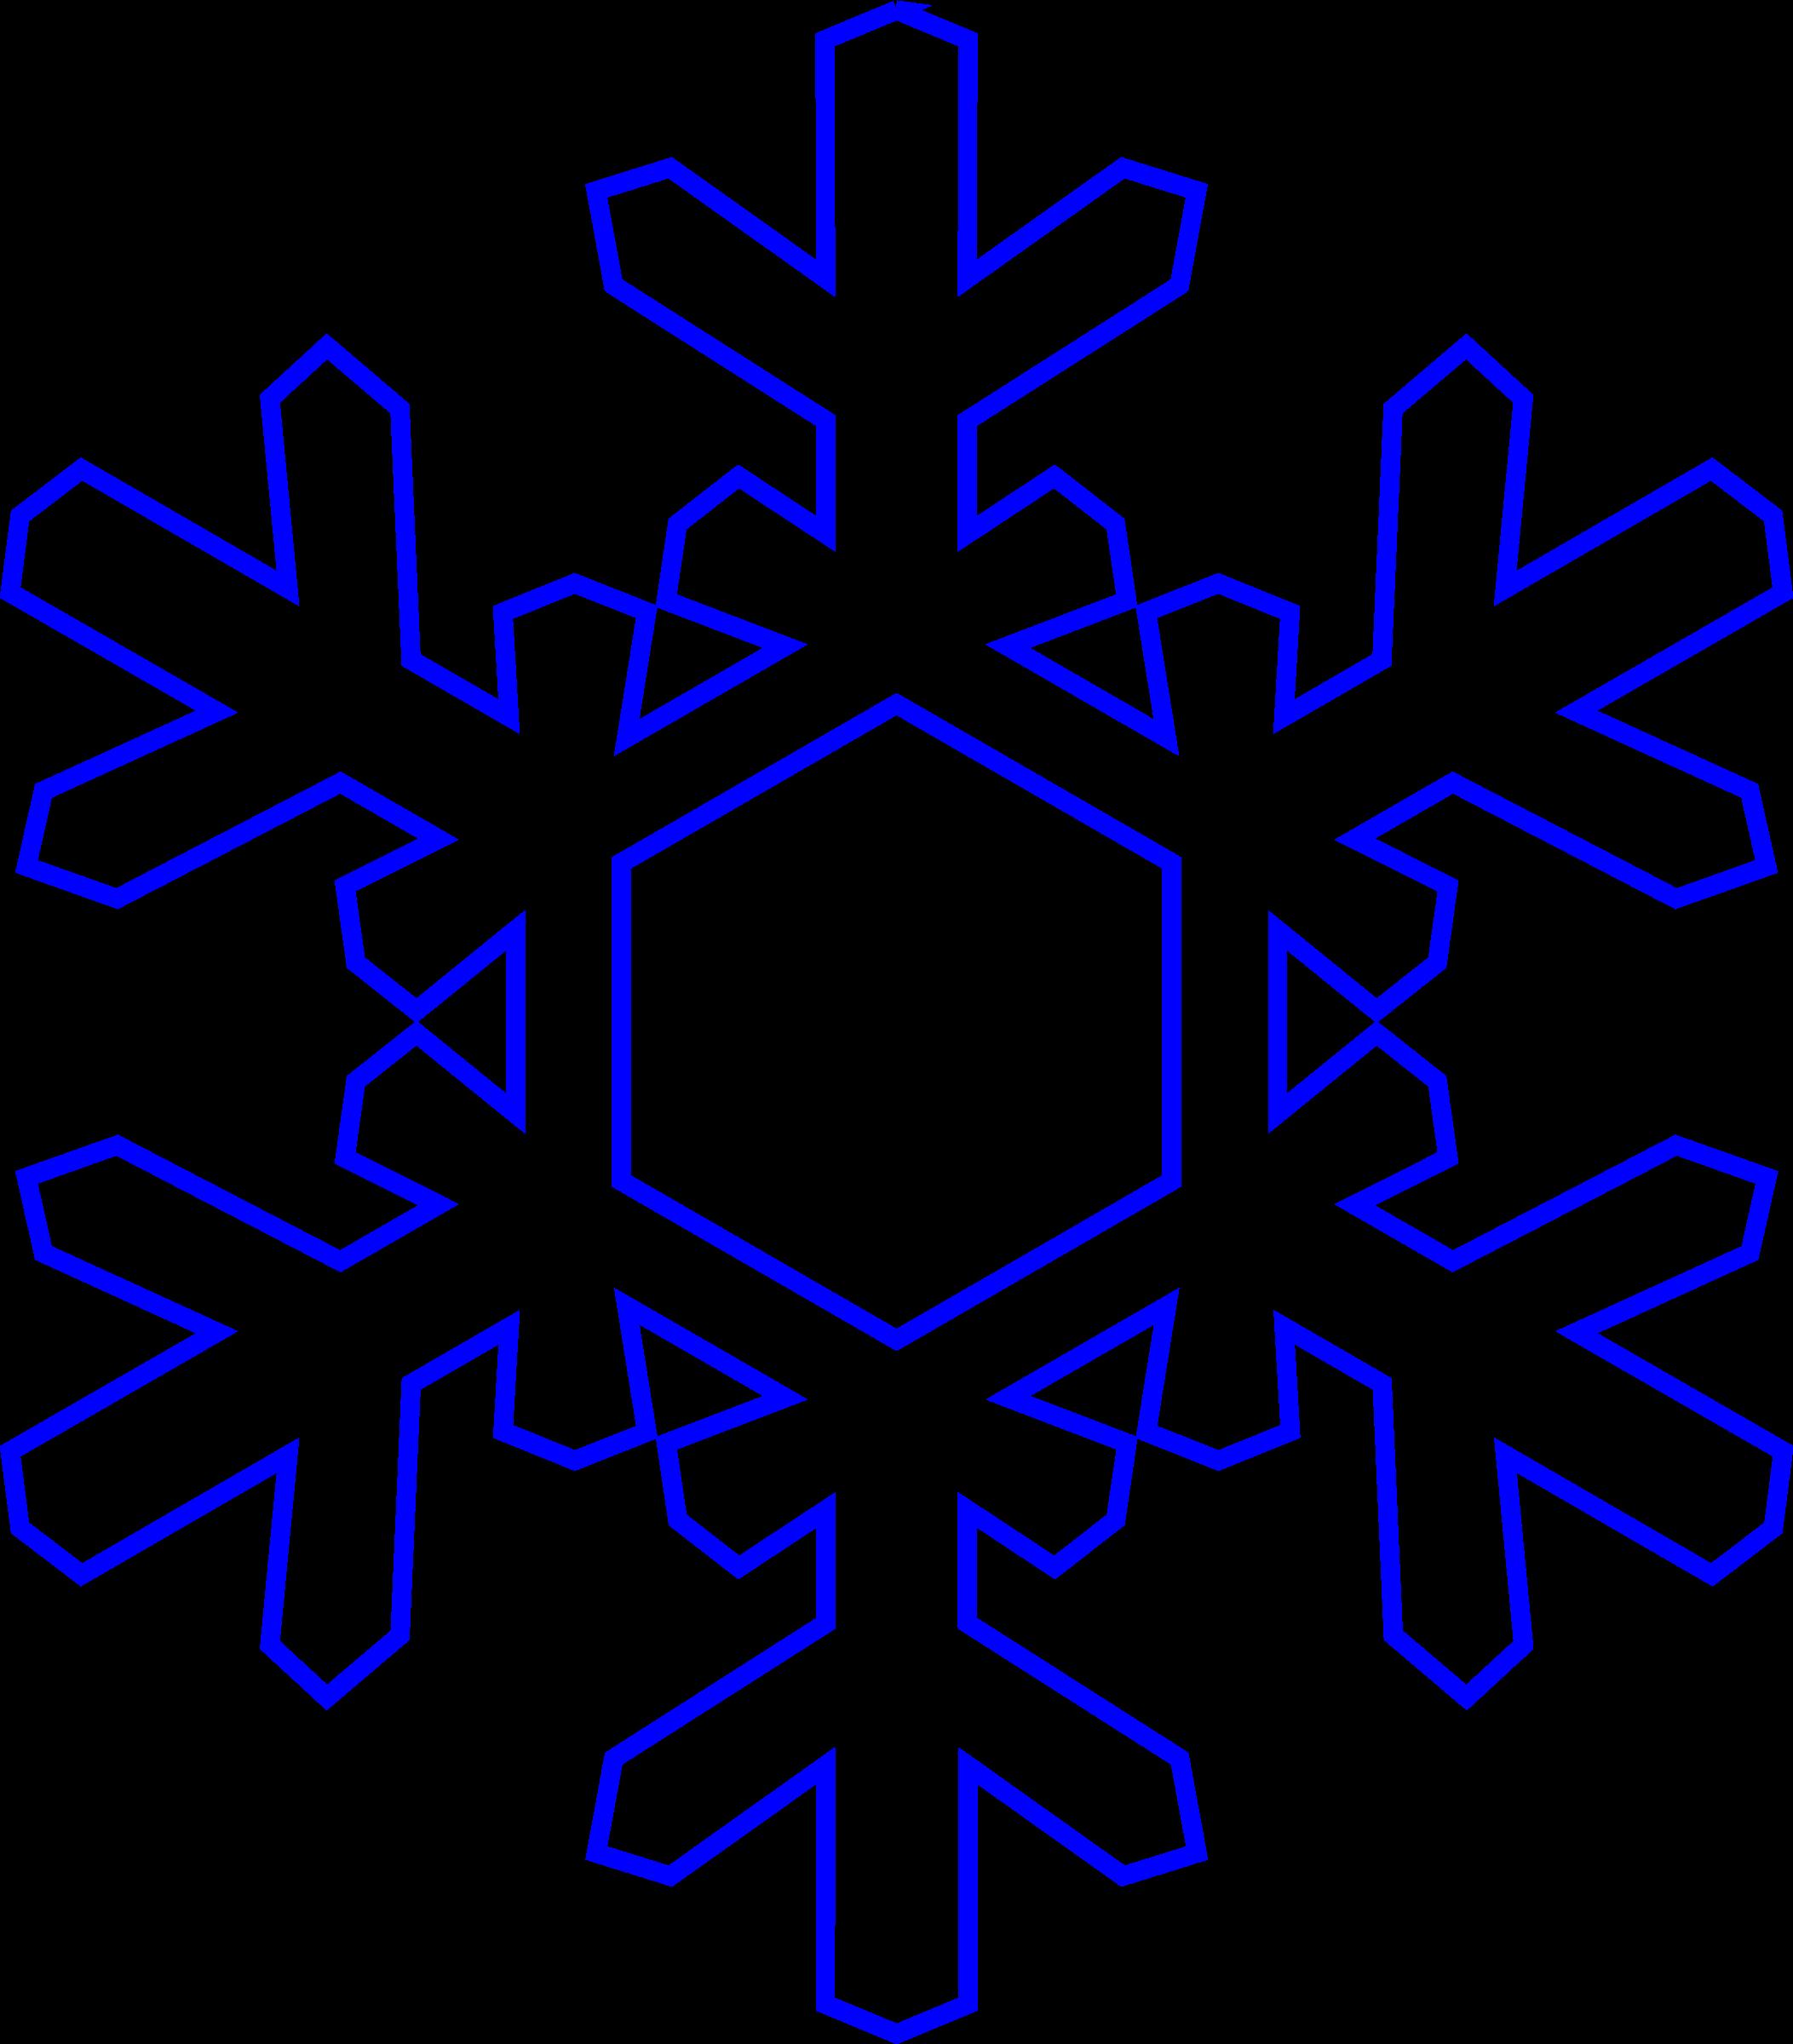 2105x2400 Snowflake Outline Clip Art